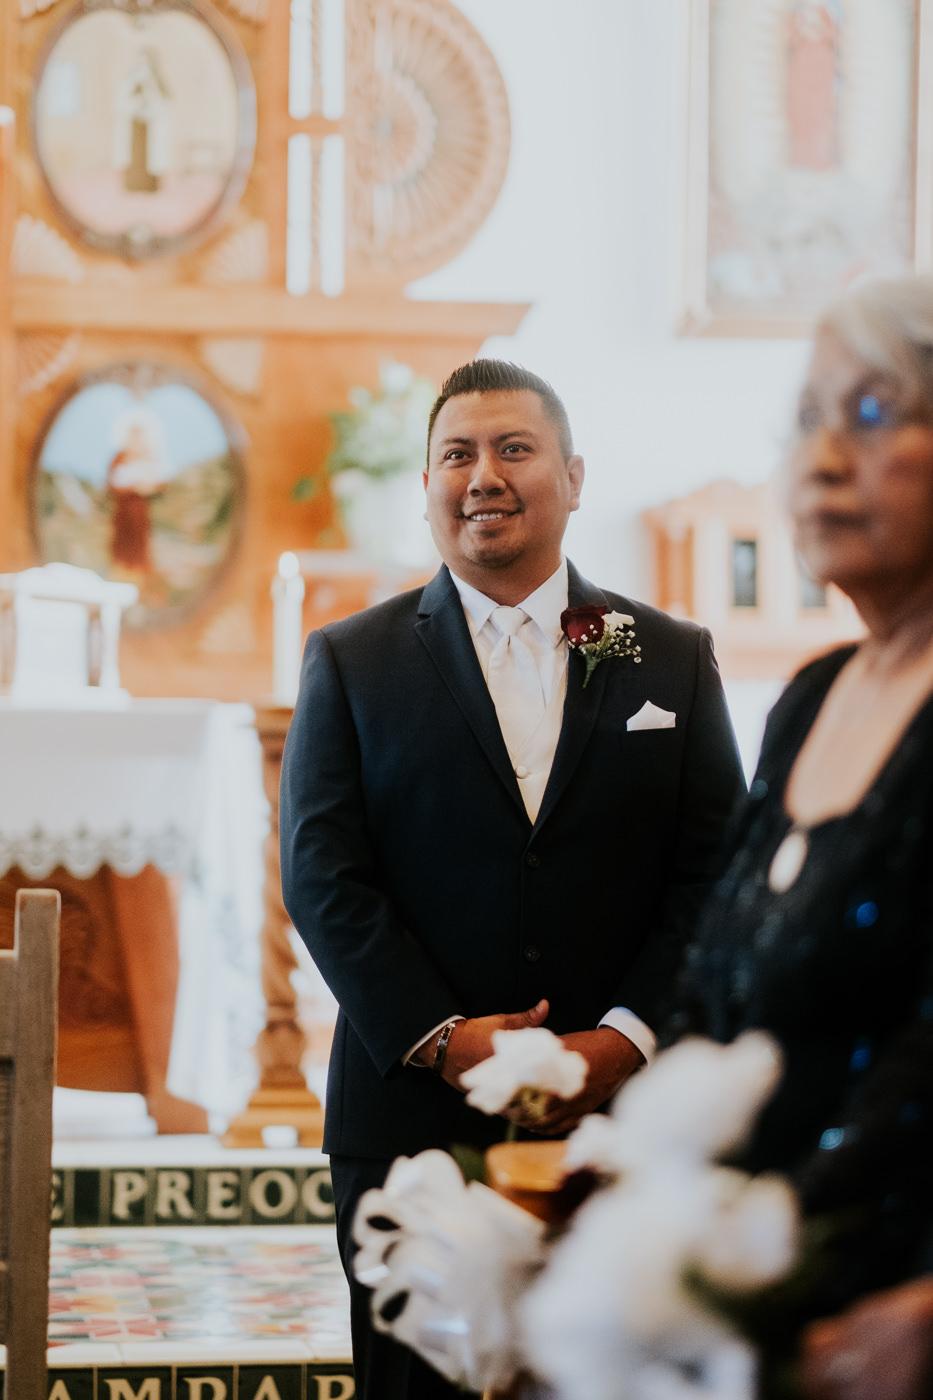 Liza+Gene.Wedding.Blog©mileswittboyer.com2018-56.jpg